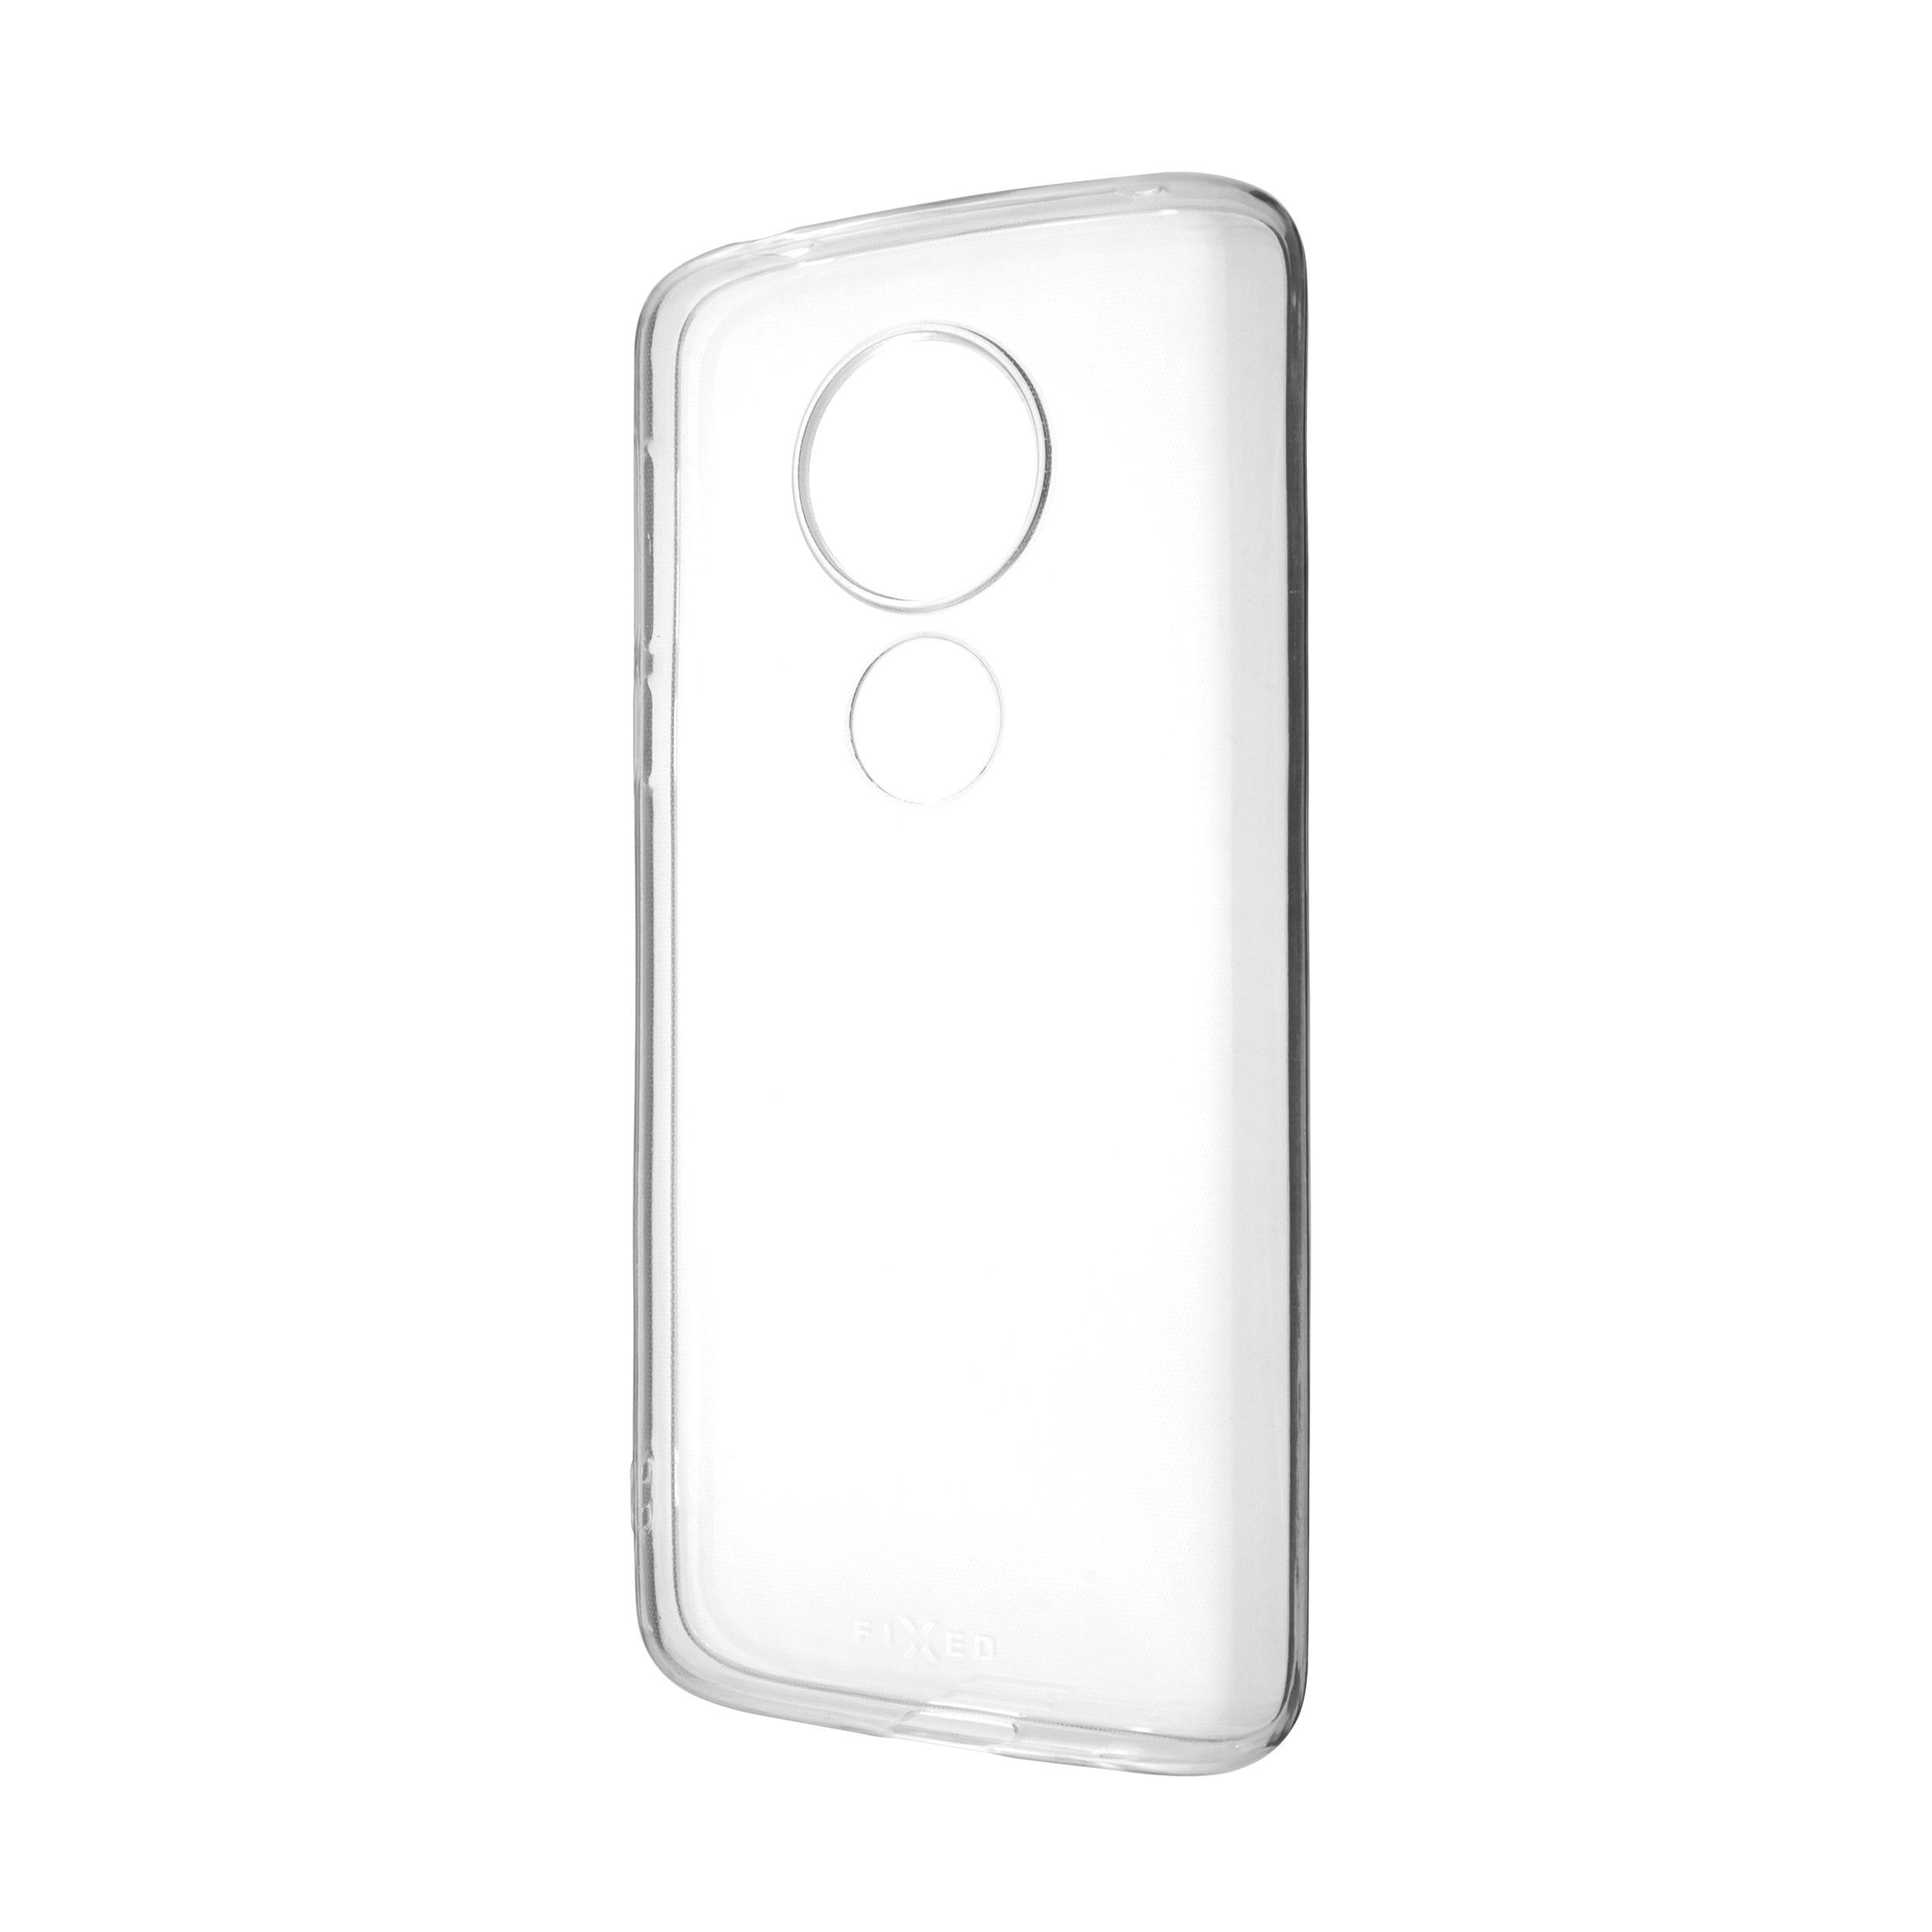 TPU gelové pouzdro FIXED pro Motorola Moto E5, čiré